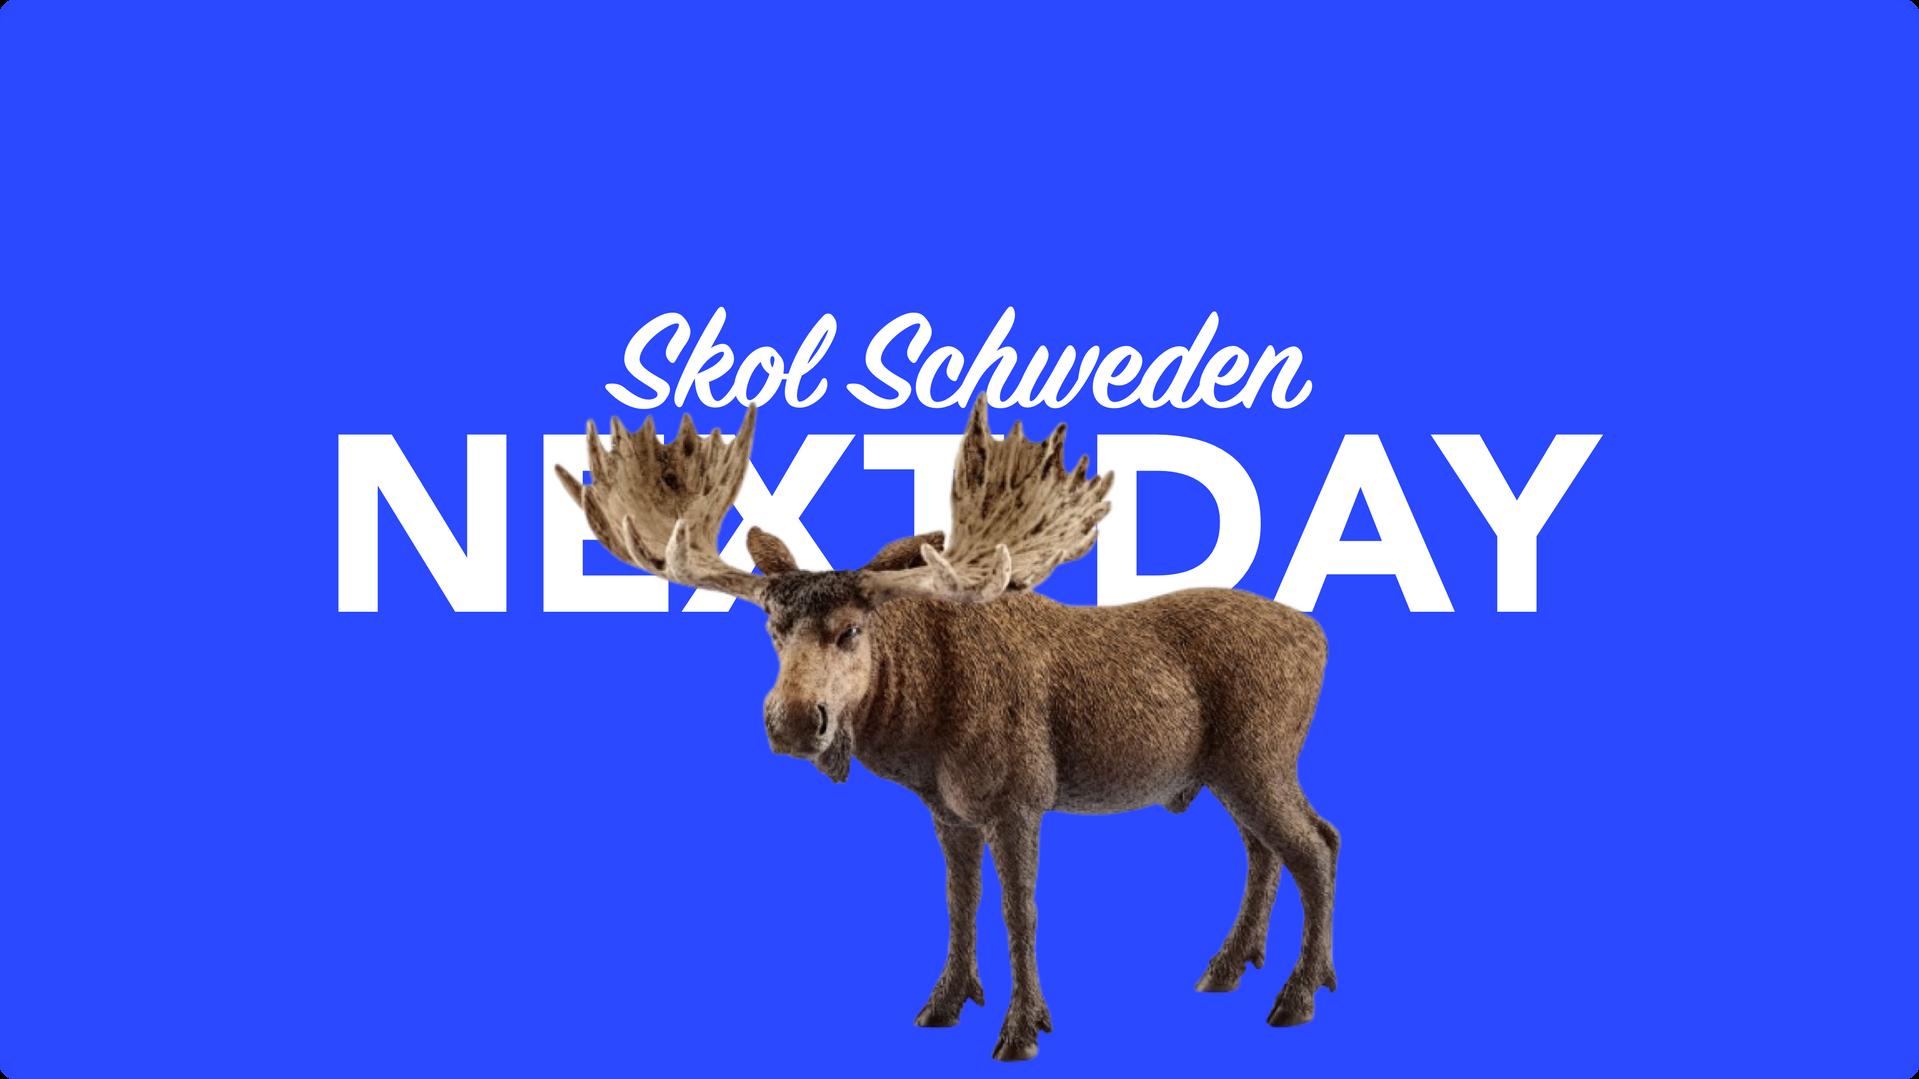 Schweden Next Day 4xpress.com